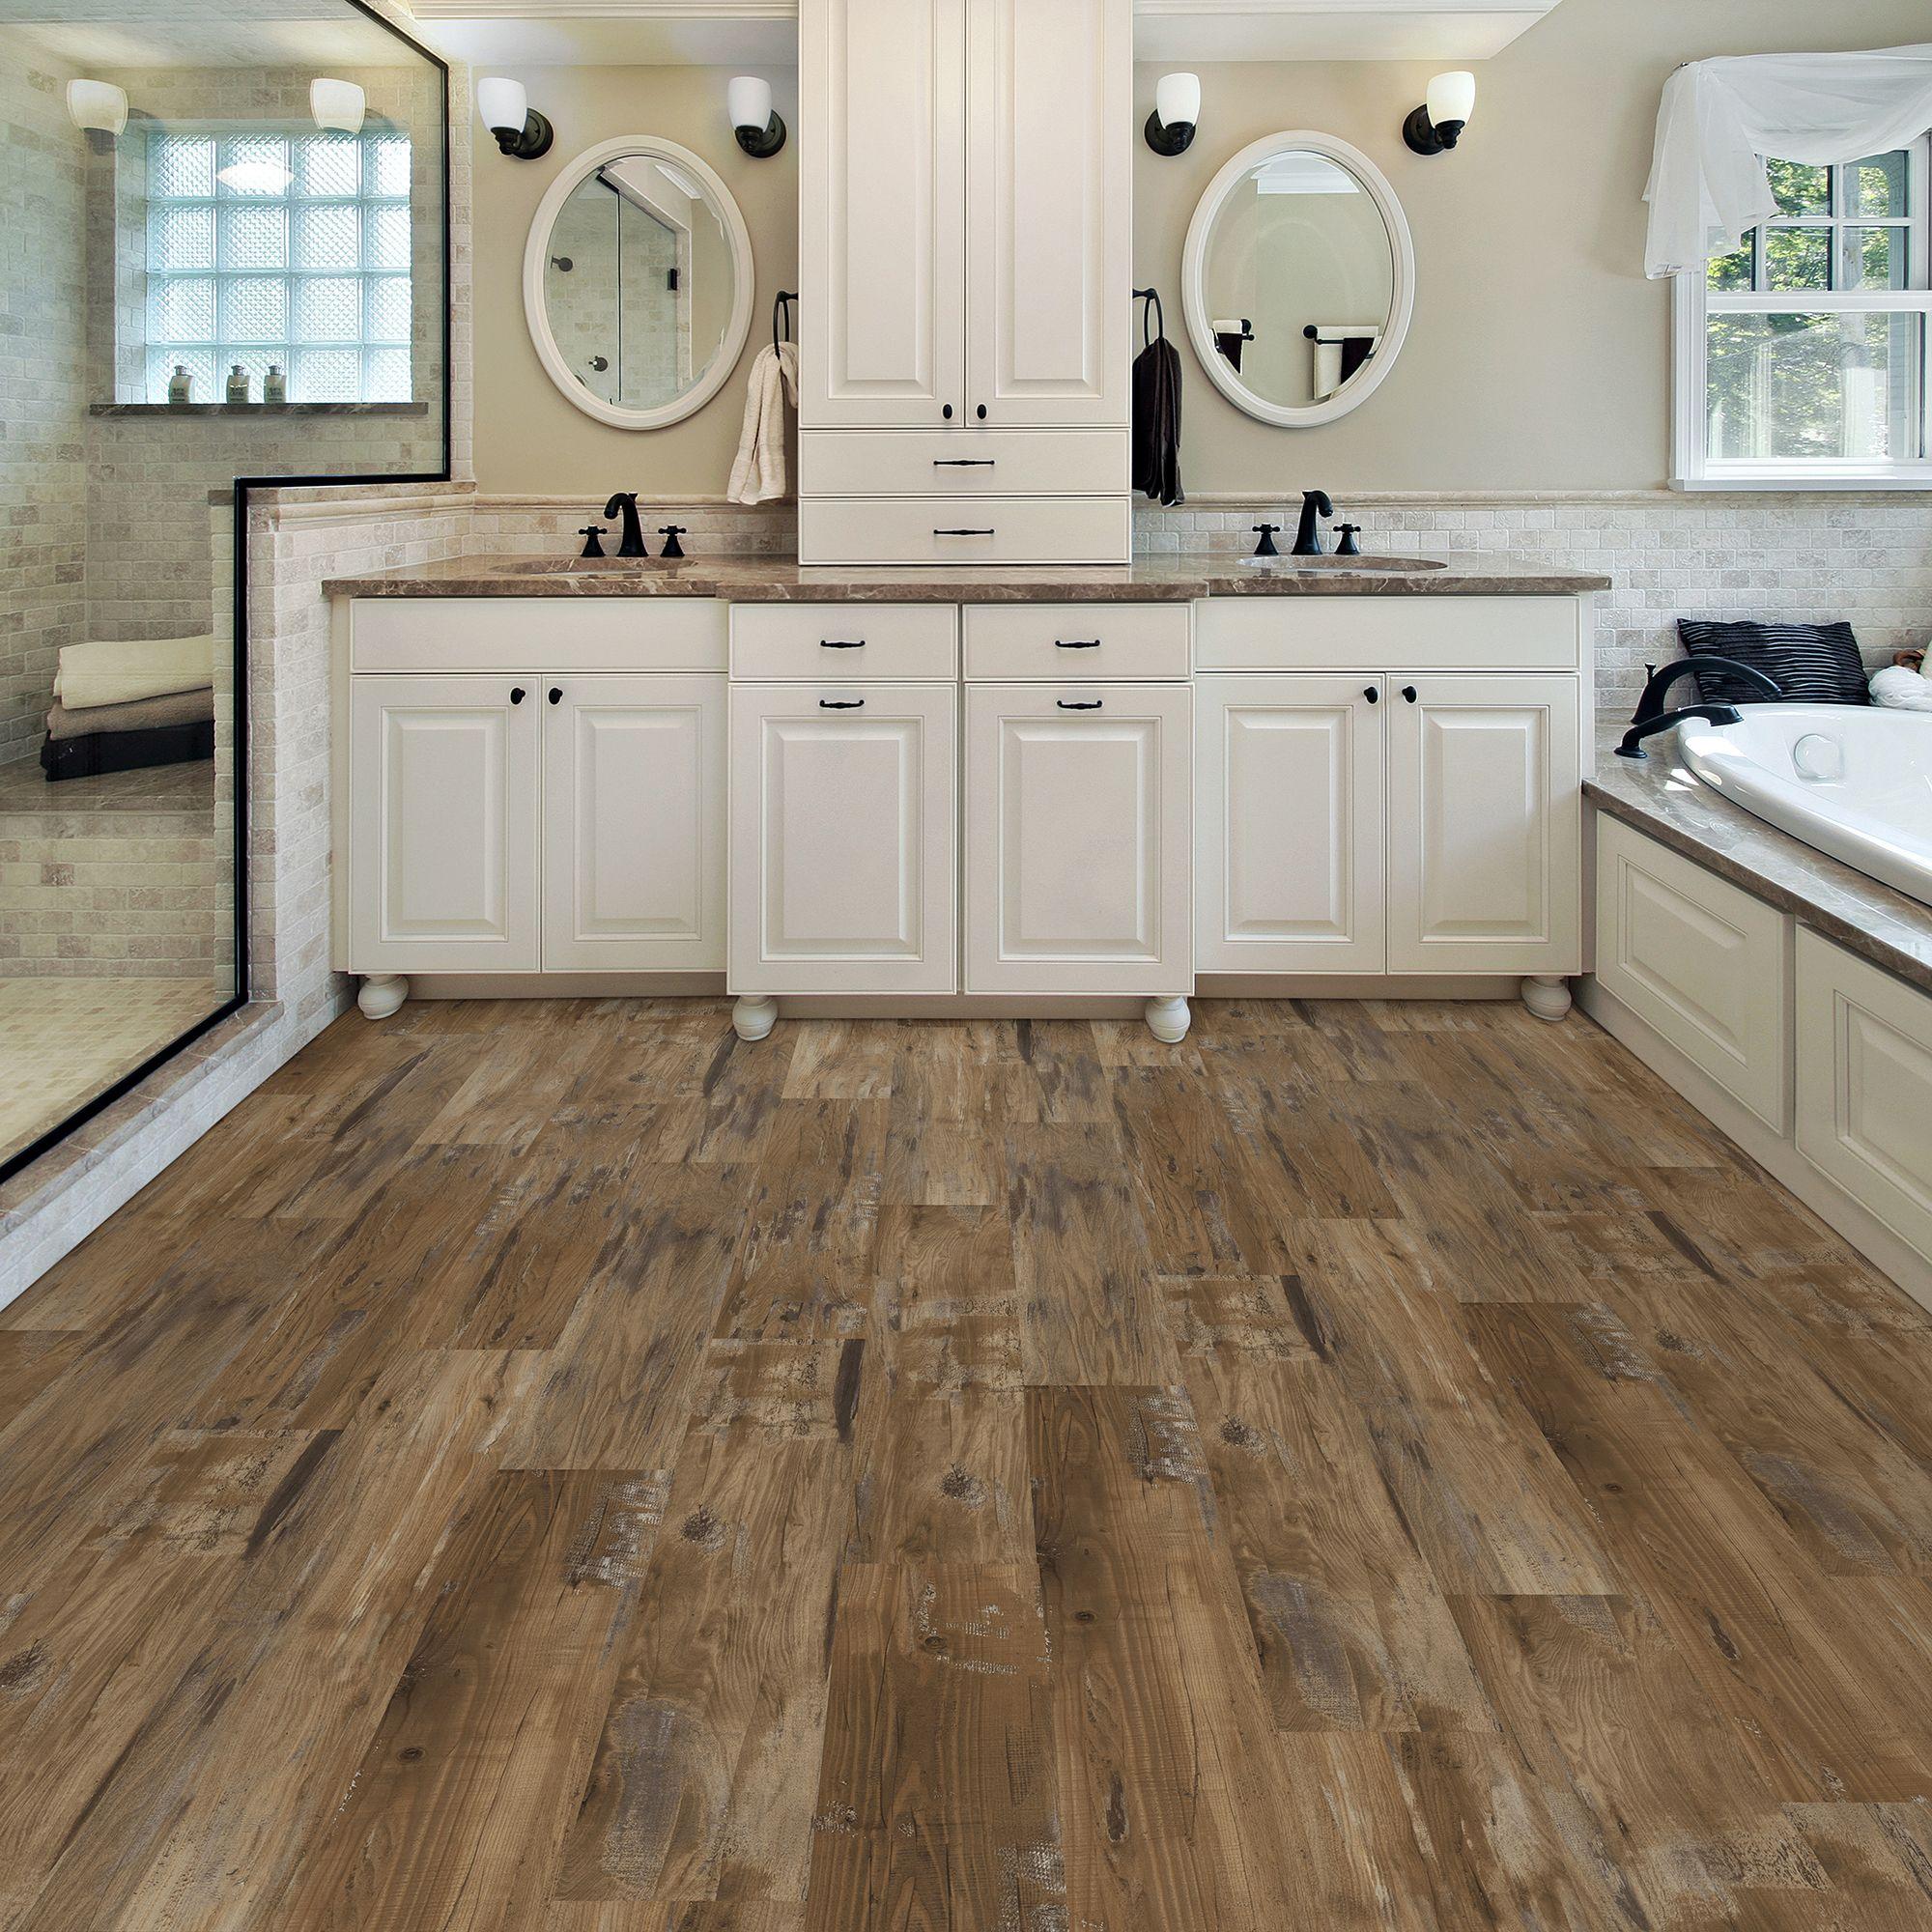 sawcut floor depot dakota vinyl new allure home flooring pin trafficmaster planks